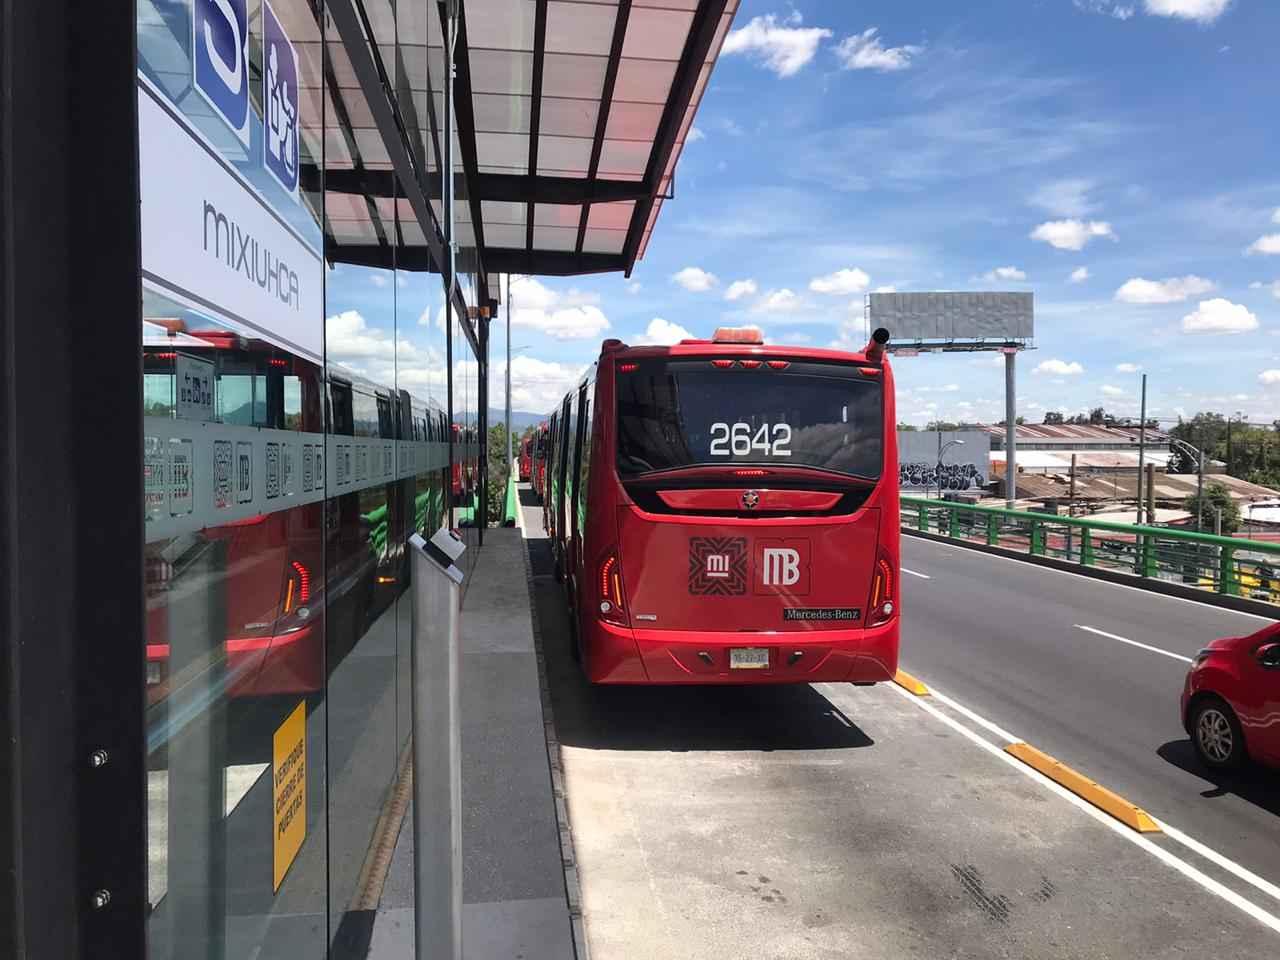 lista-primera-etapa-de-ampliacion-de-linea-5-del-metrobus